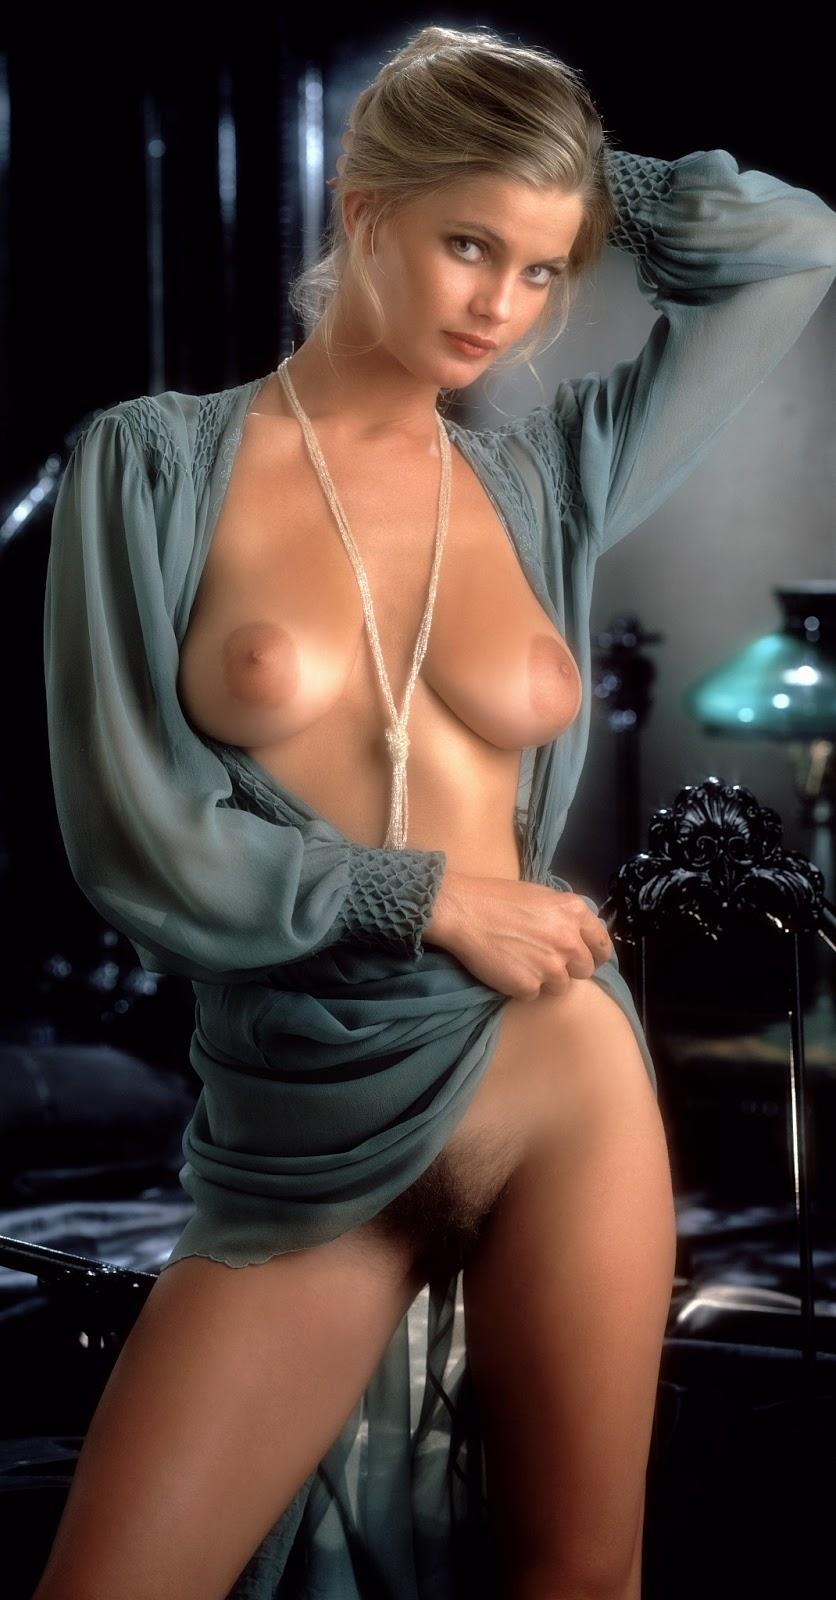 Monique jeanette nude fucking image